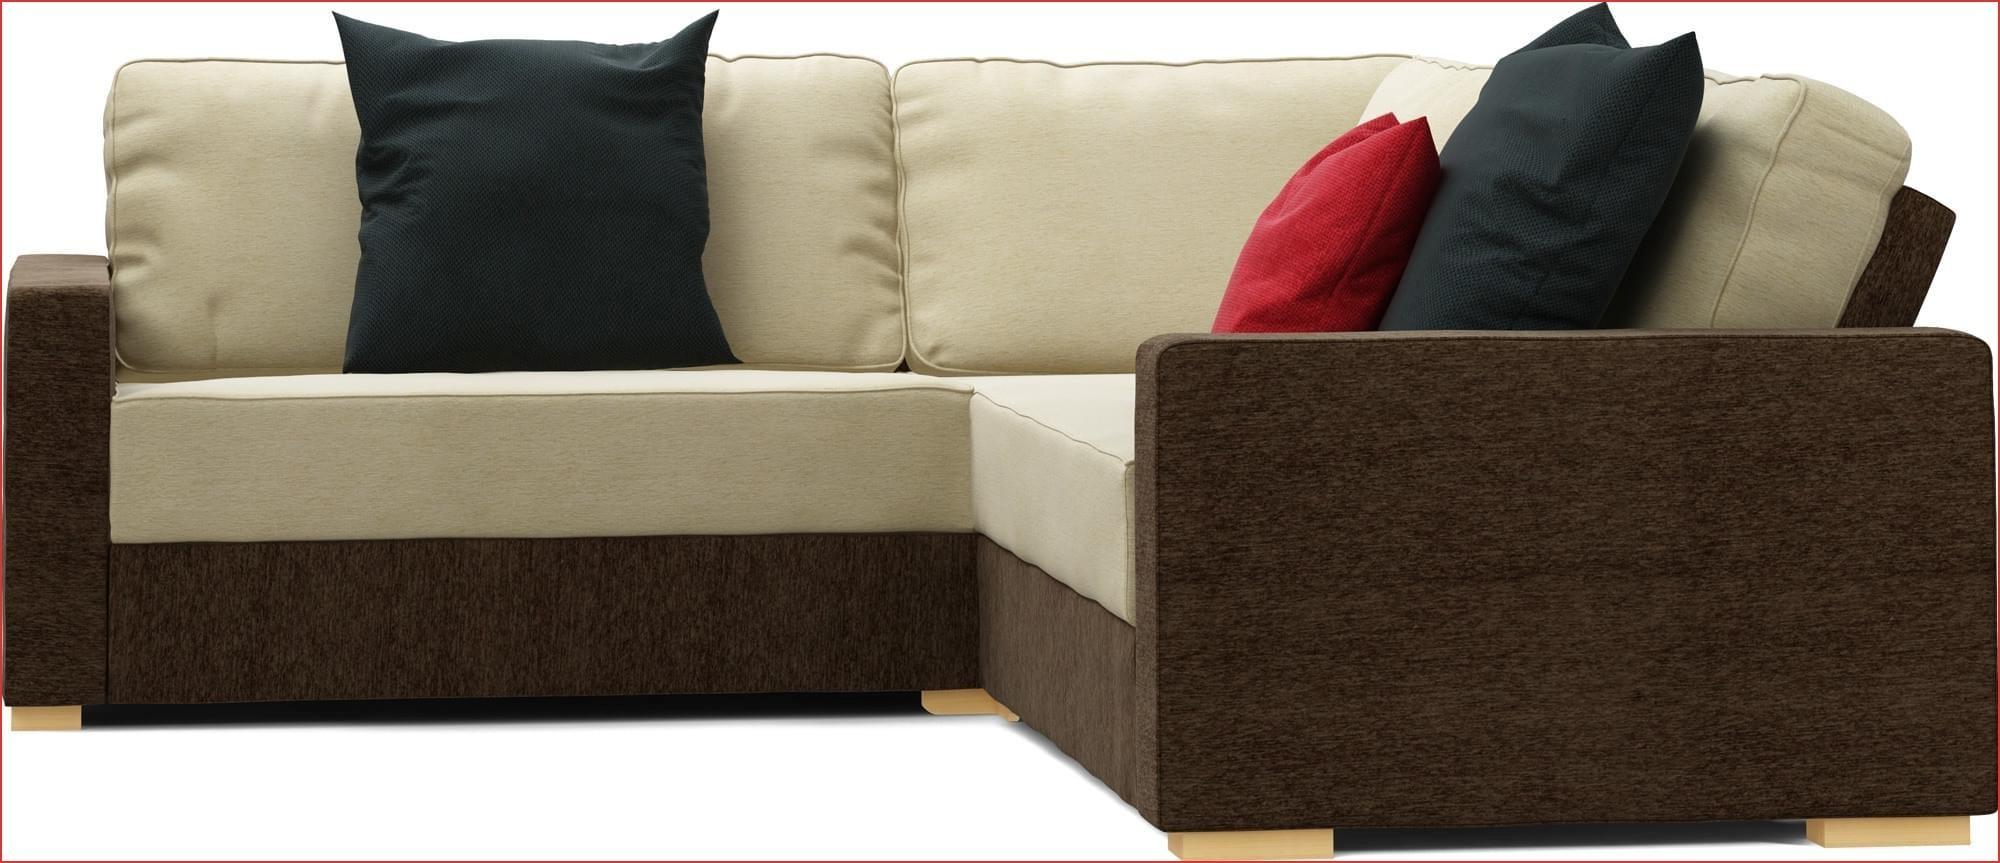 2X2 Corner Sofa Beautiful Xia 2X2 Corner Sofa Custom Made Corner Pertaining To 2X2 Corner Sofas (Image 1 of 21)